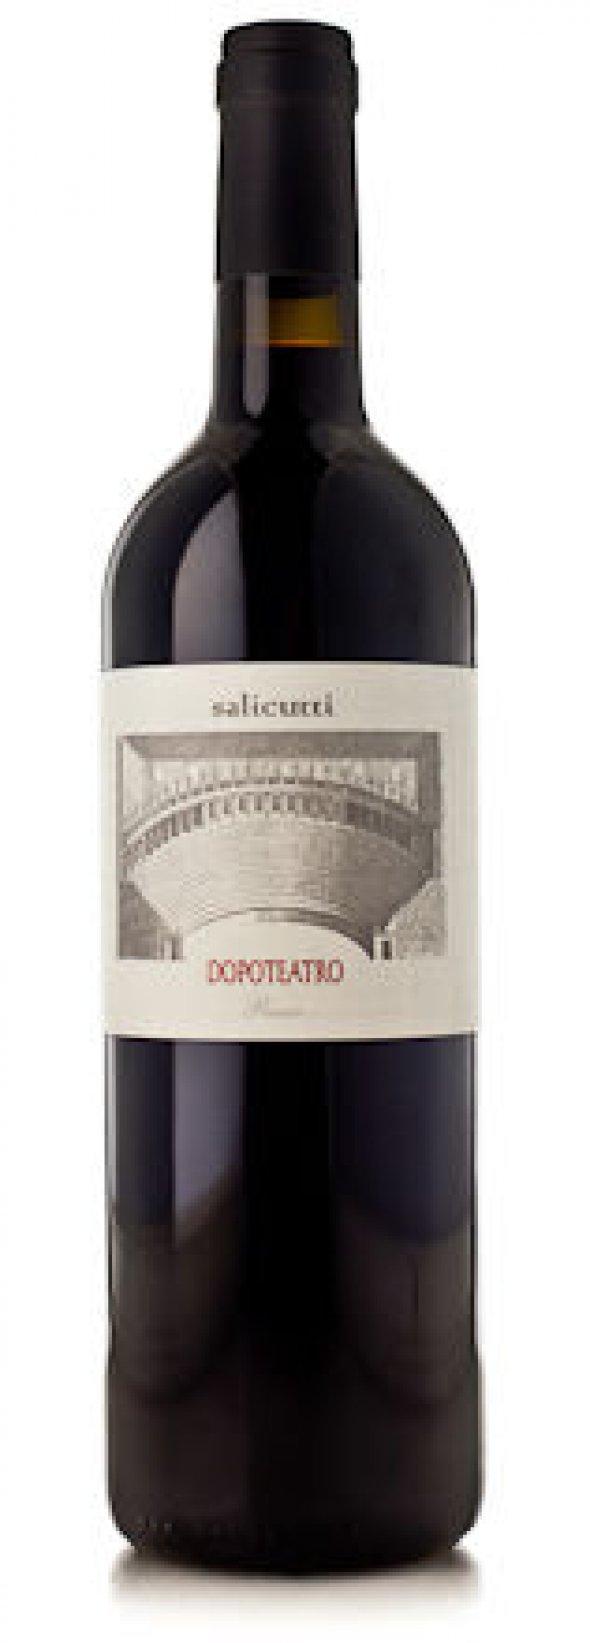 Podere Salicutti, Sant Antimo Dopoteatro, Tuscany, Sant Antimo, Italy, DOC